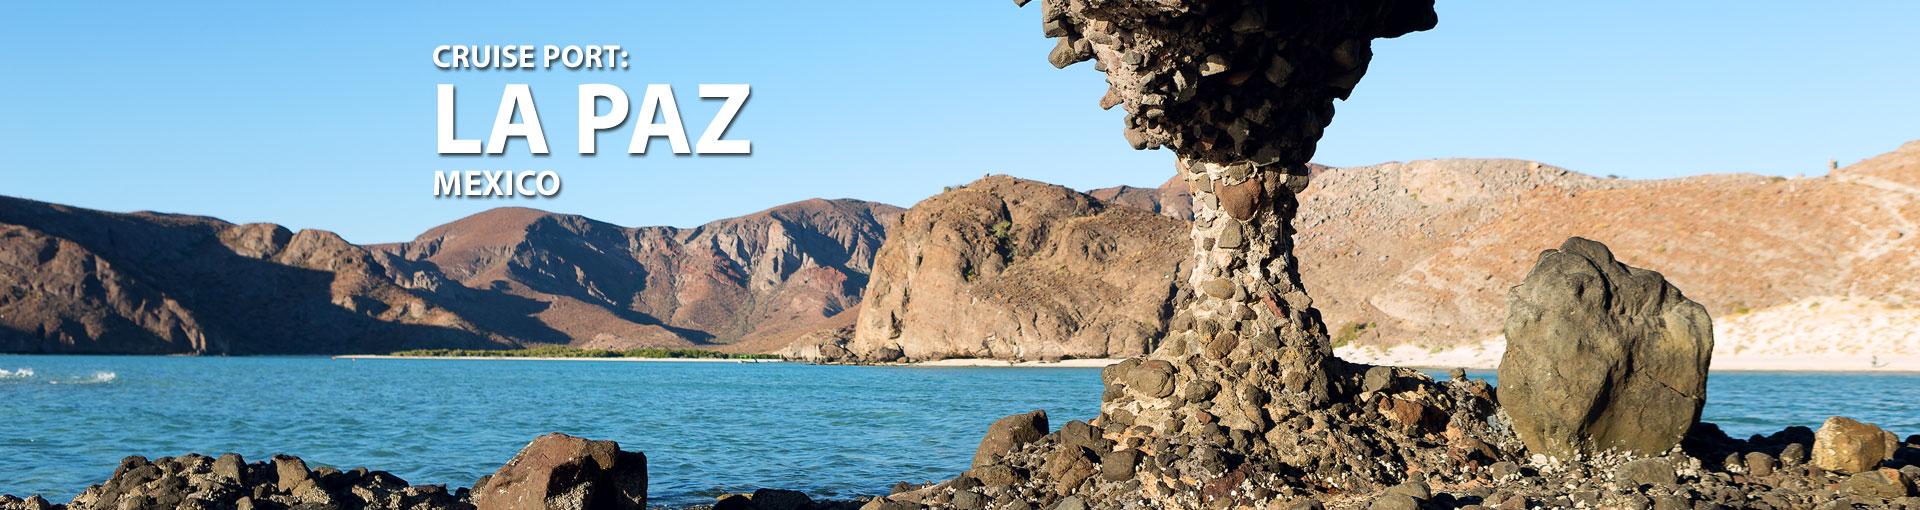 Cruises to La Paz, Mexico